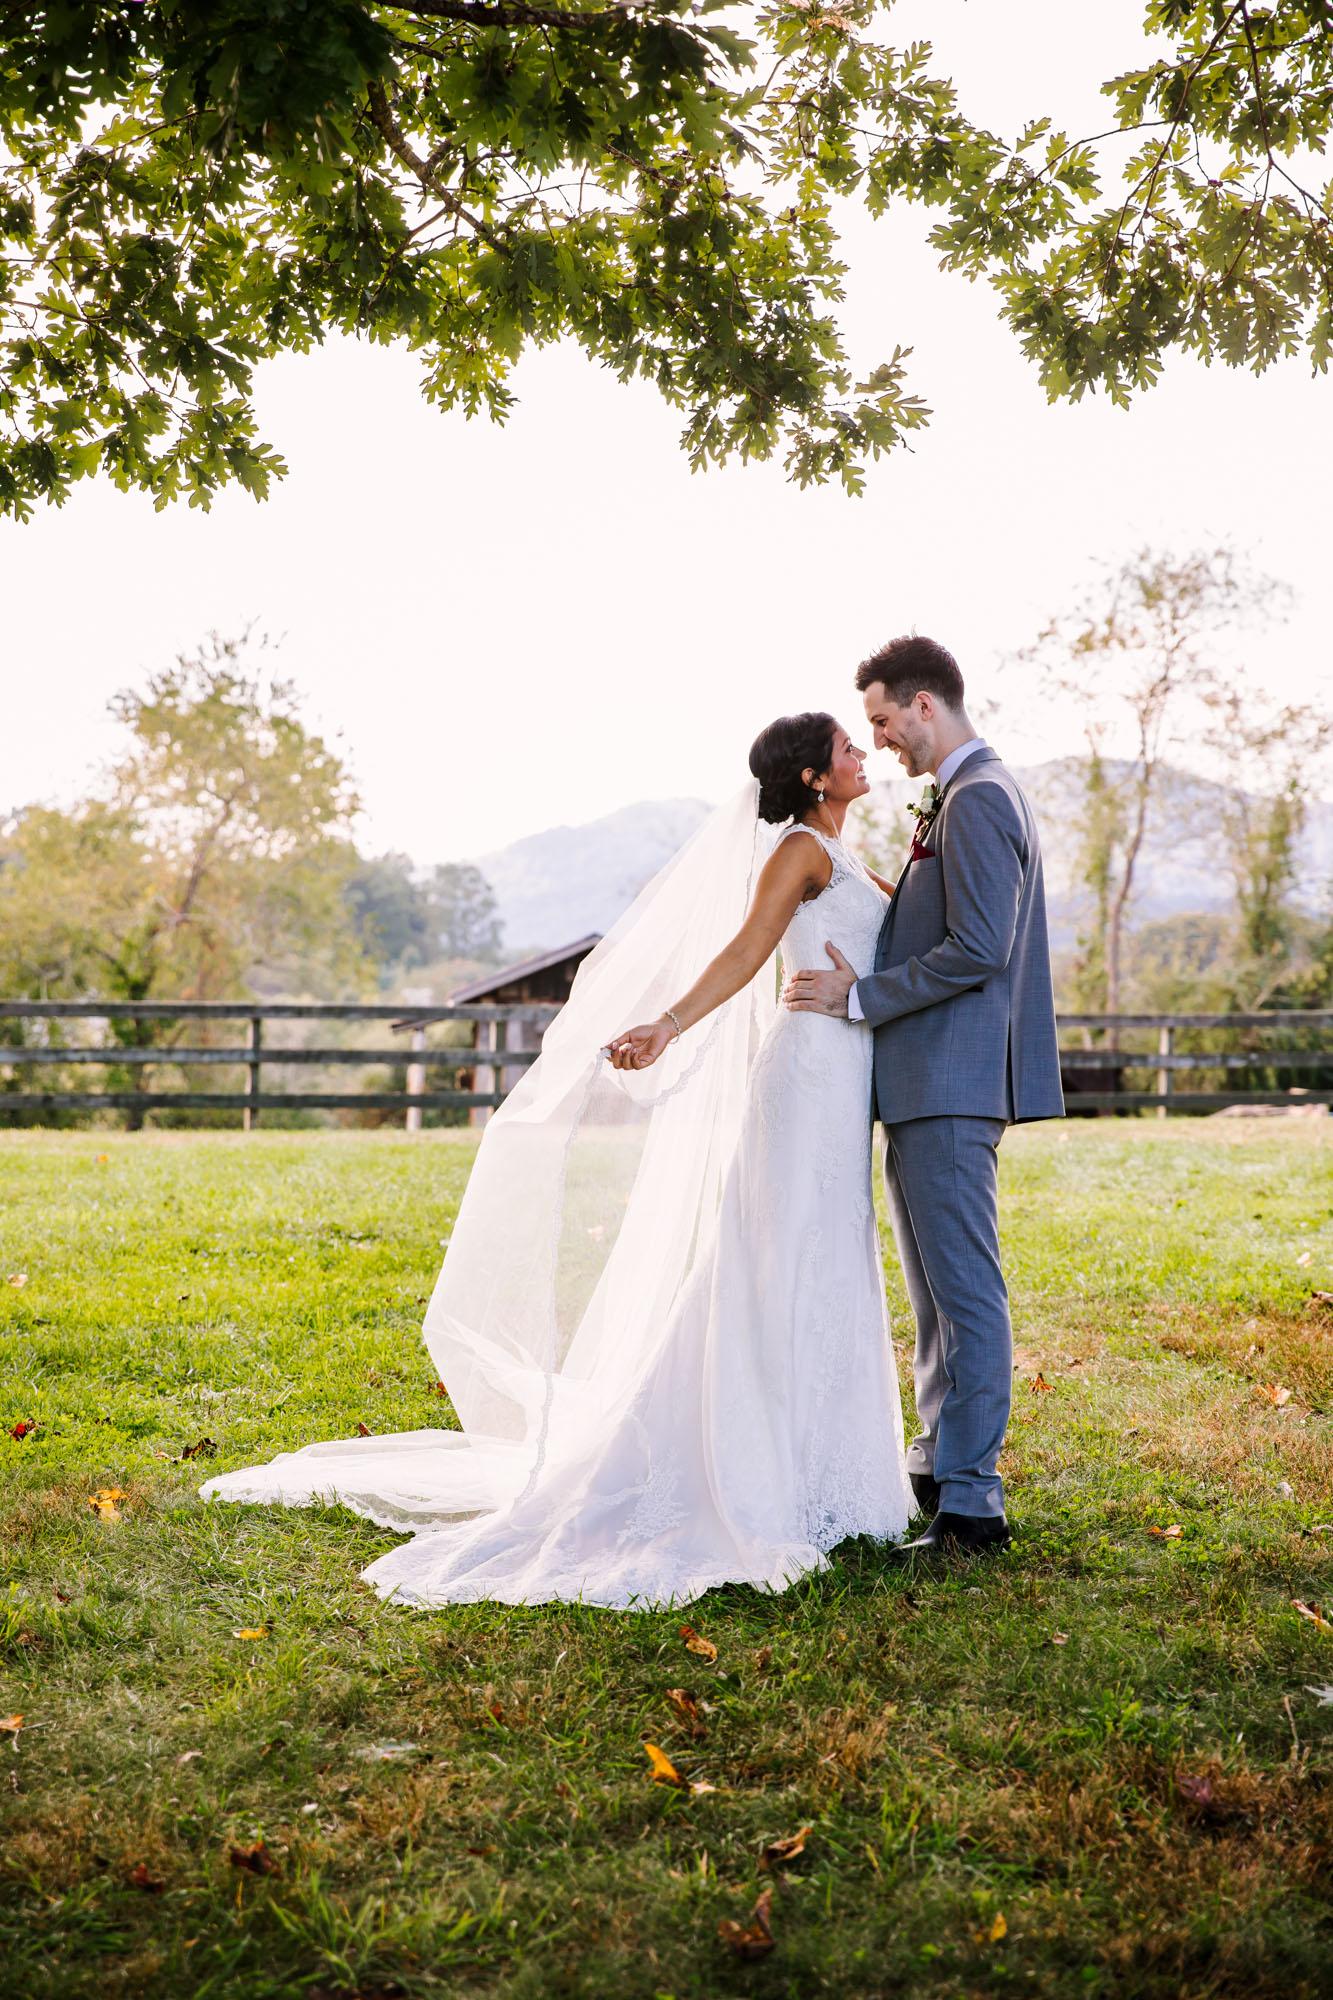 Waynesville NC Wedding Photography | Bride and Groom Portrait under the Tree on the Farm